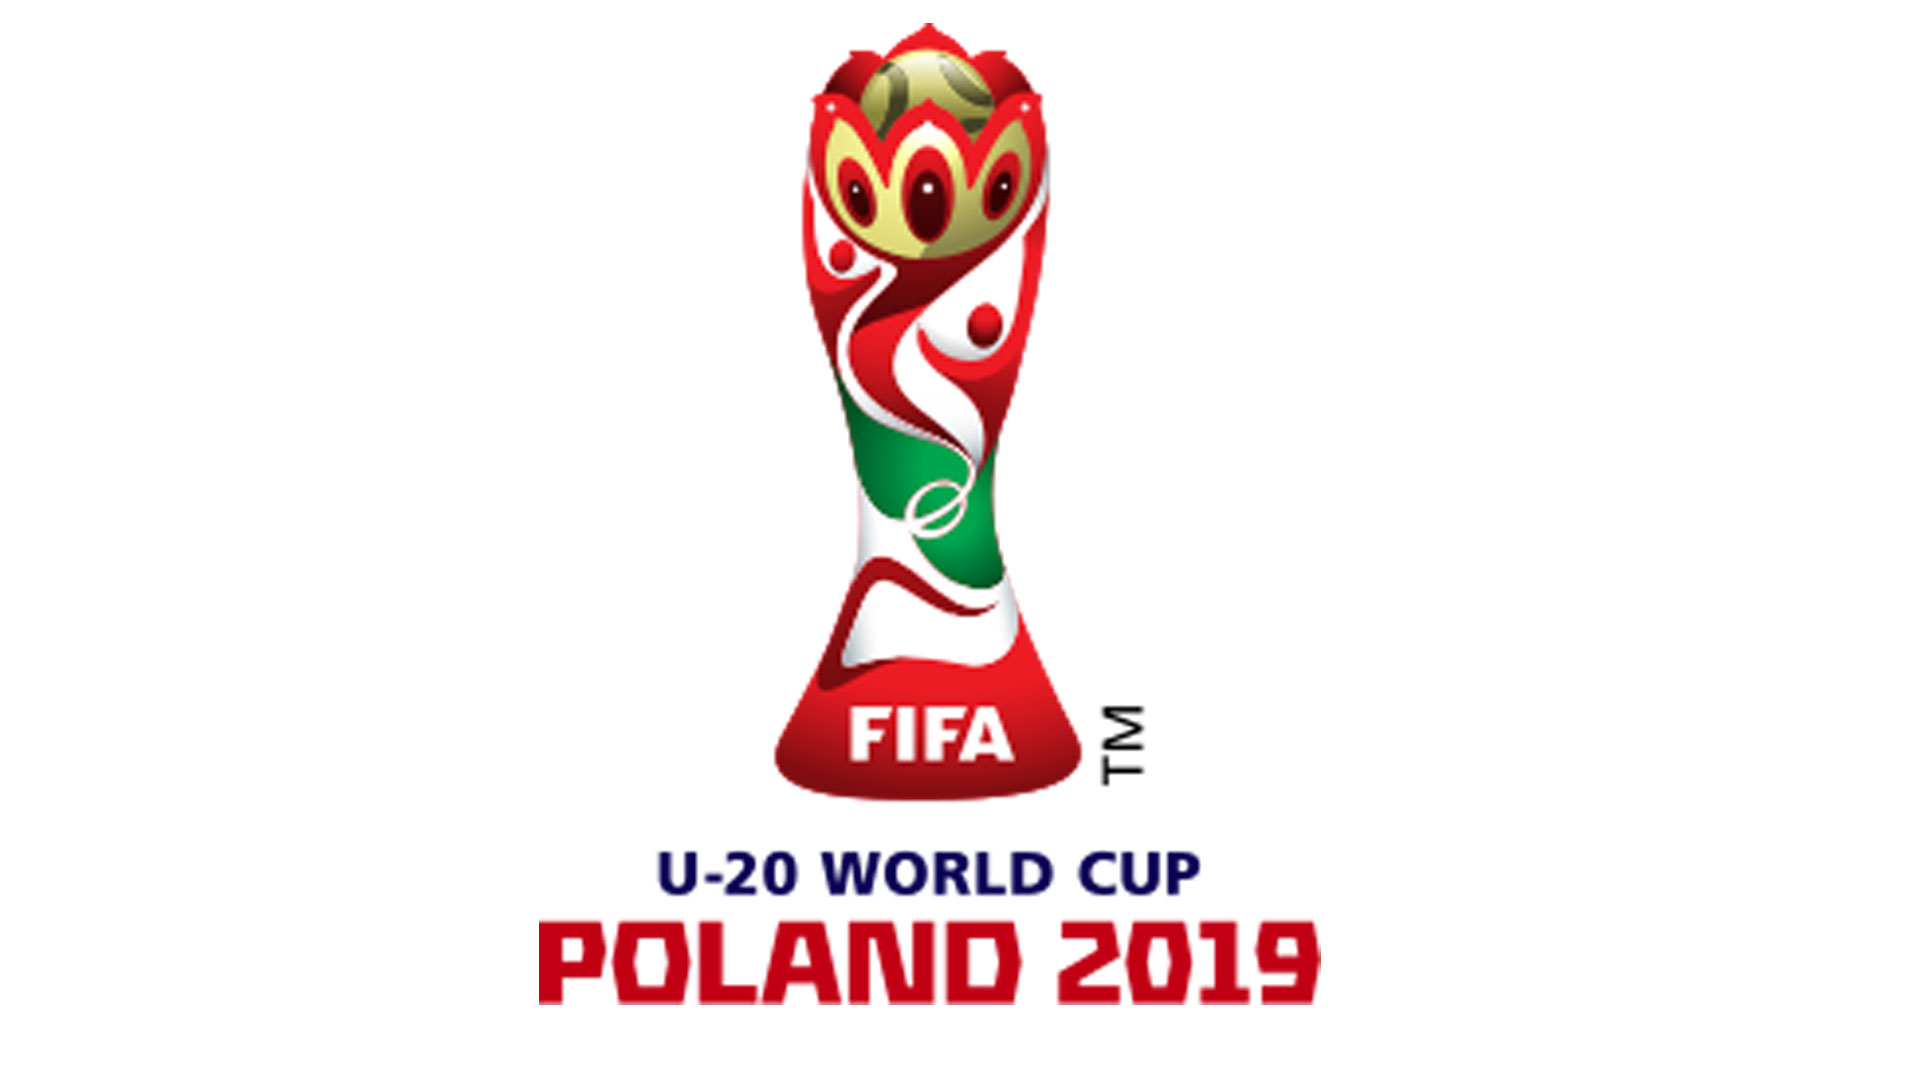 e83ece31534 FIFA U-20 World Cup 2019  Senegal vs. Poland - Video - TSN